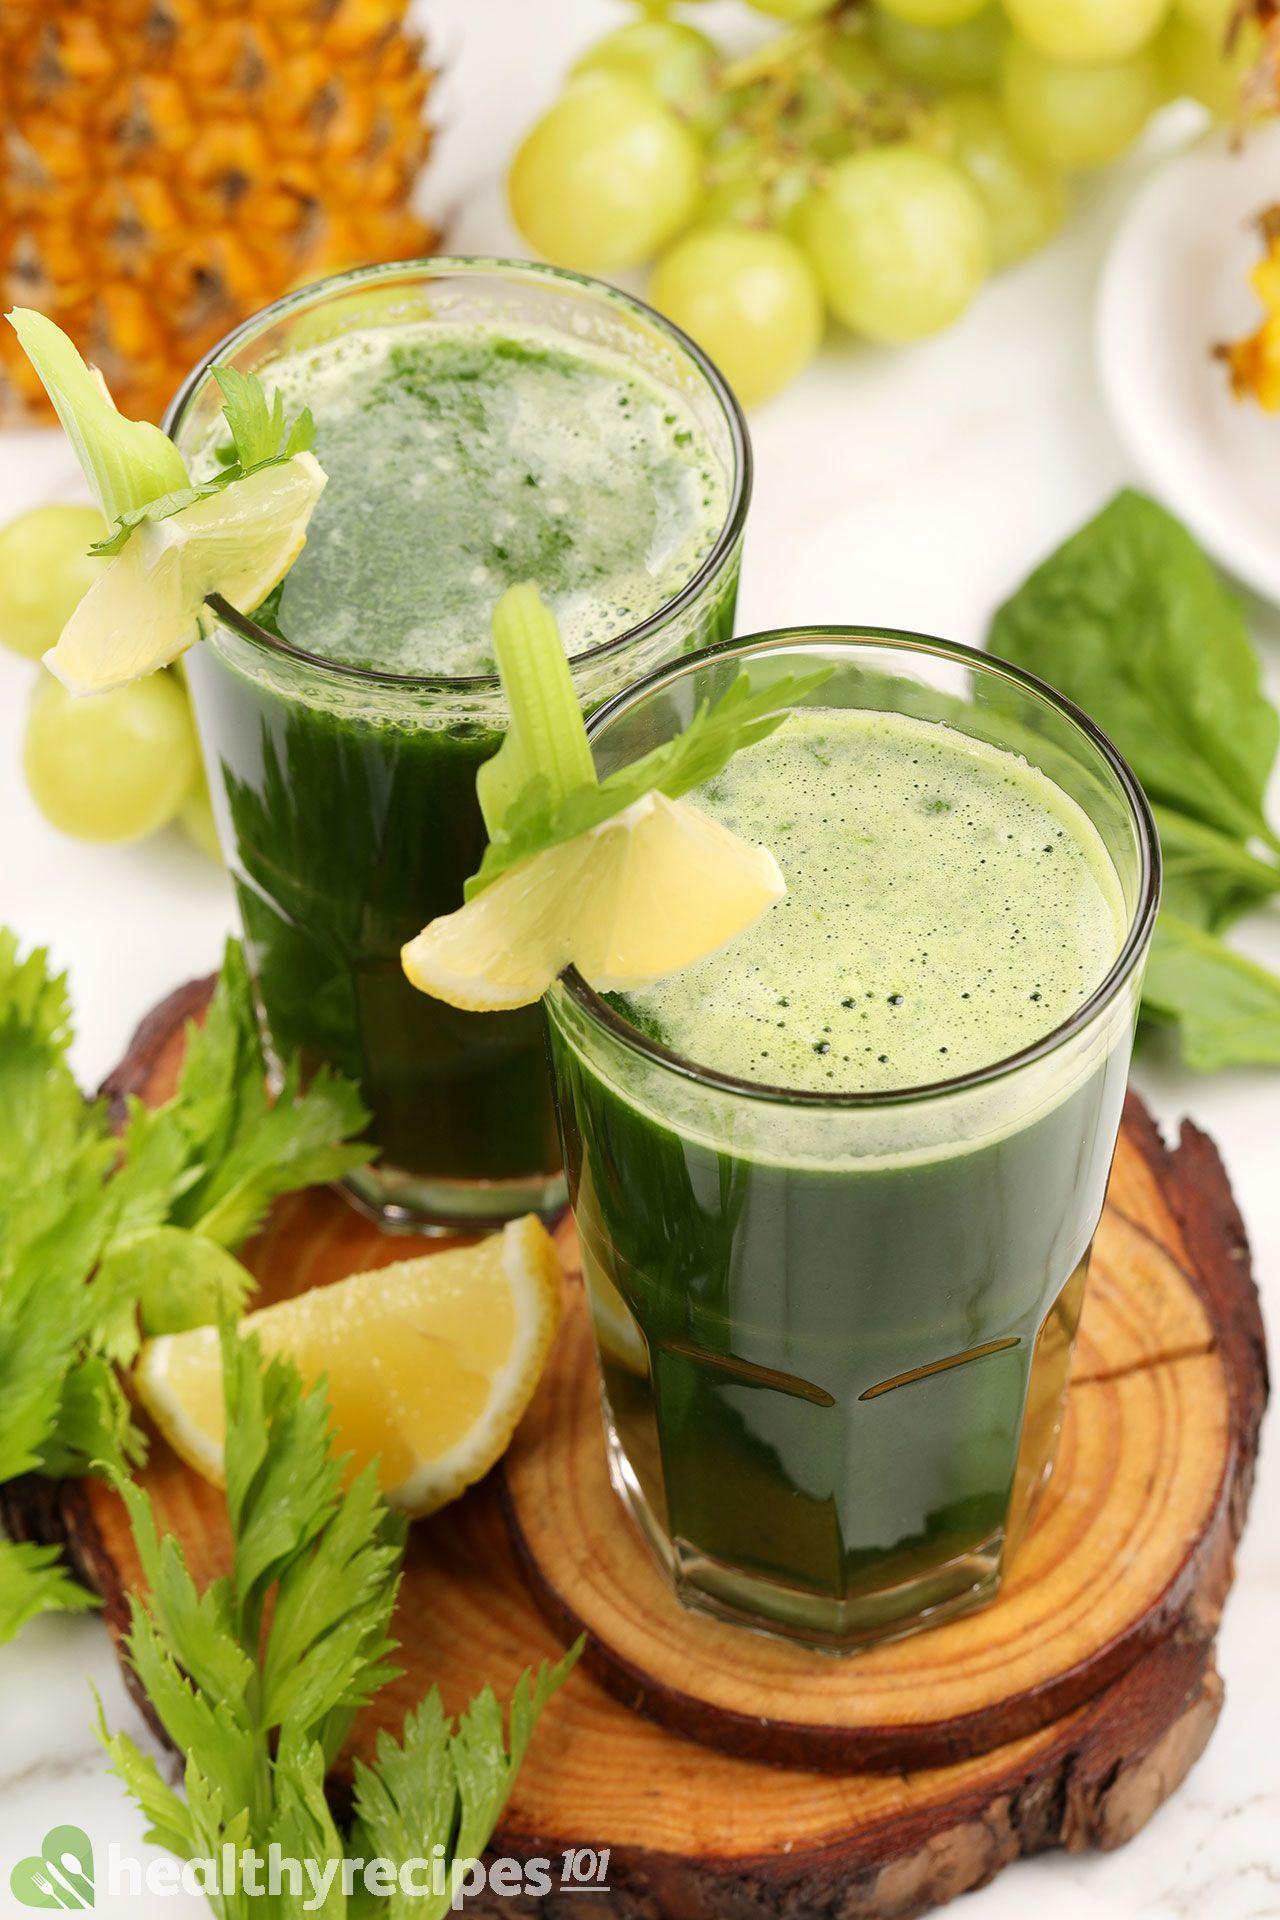 health benefits of this juice